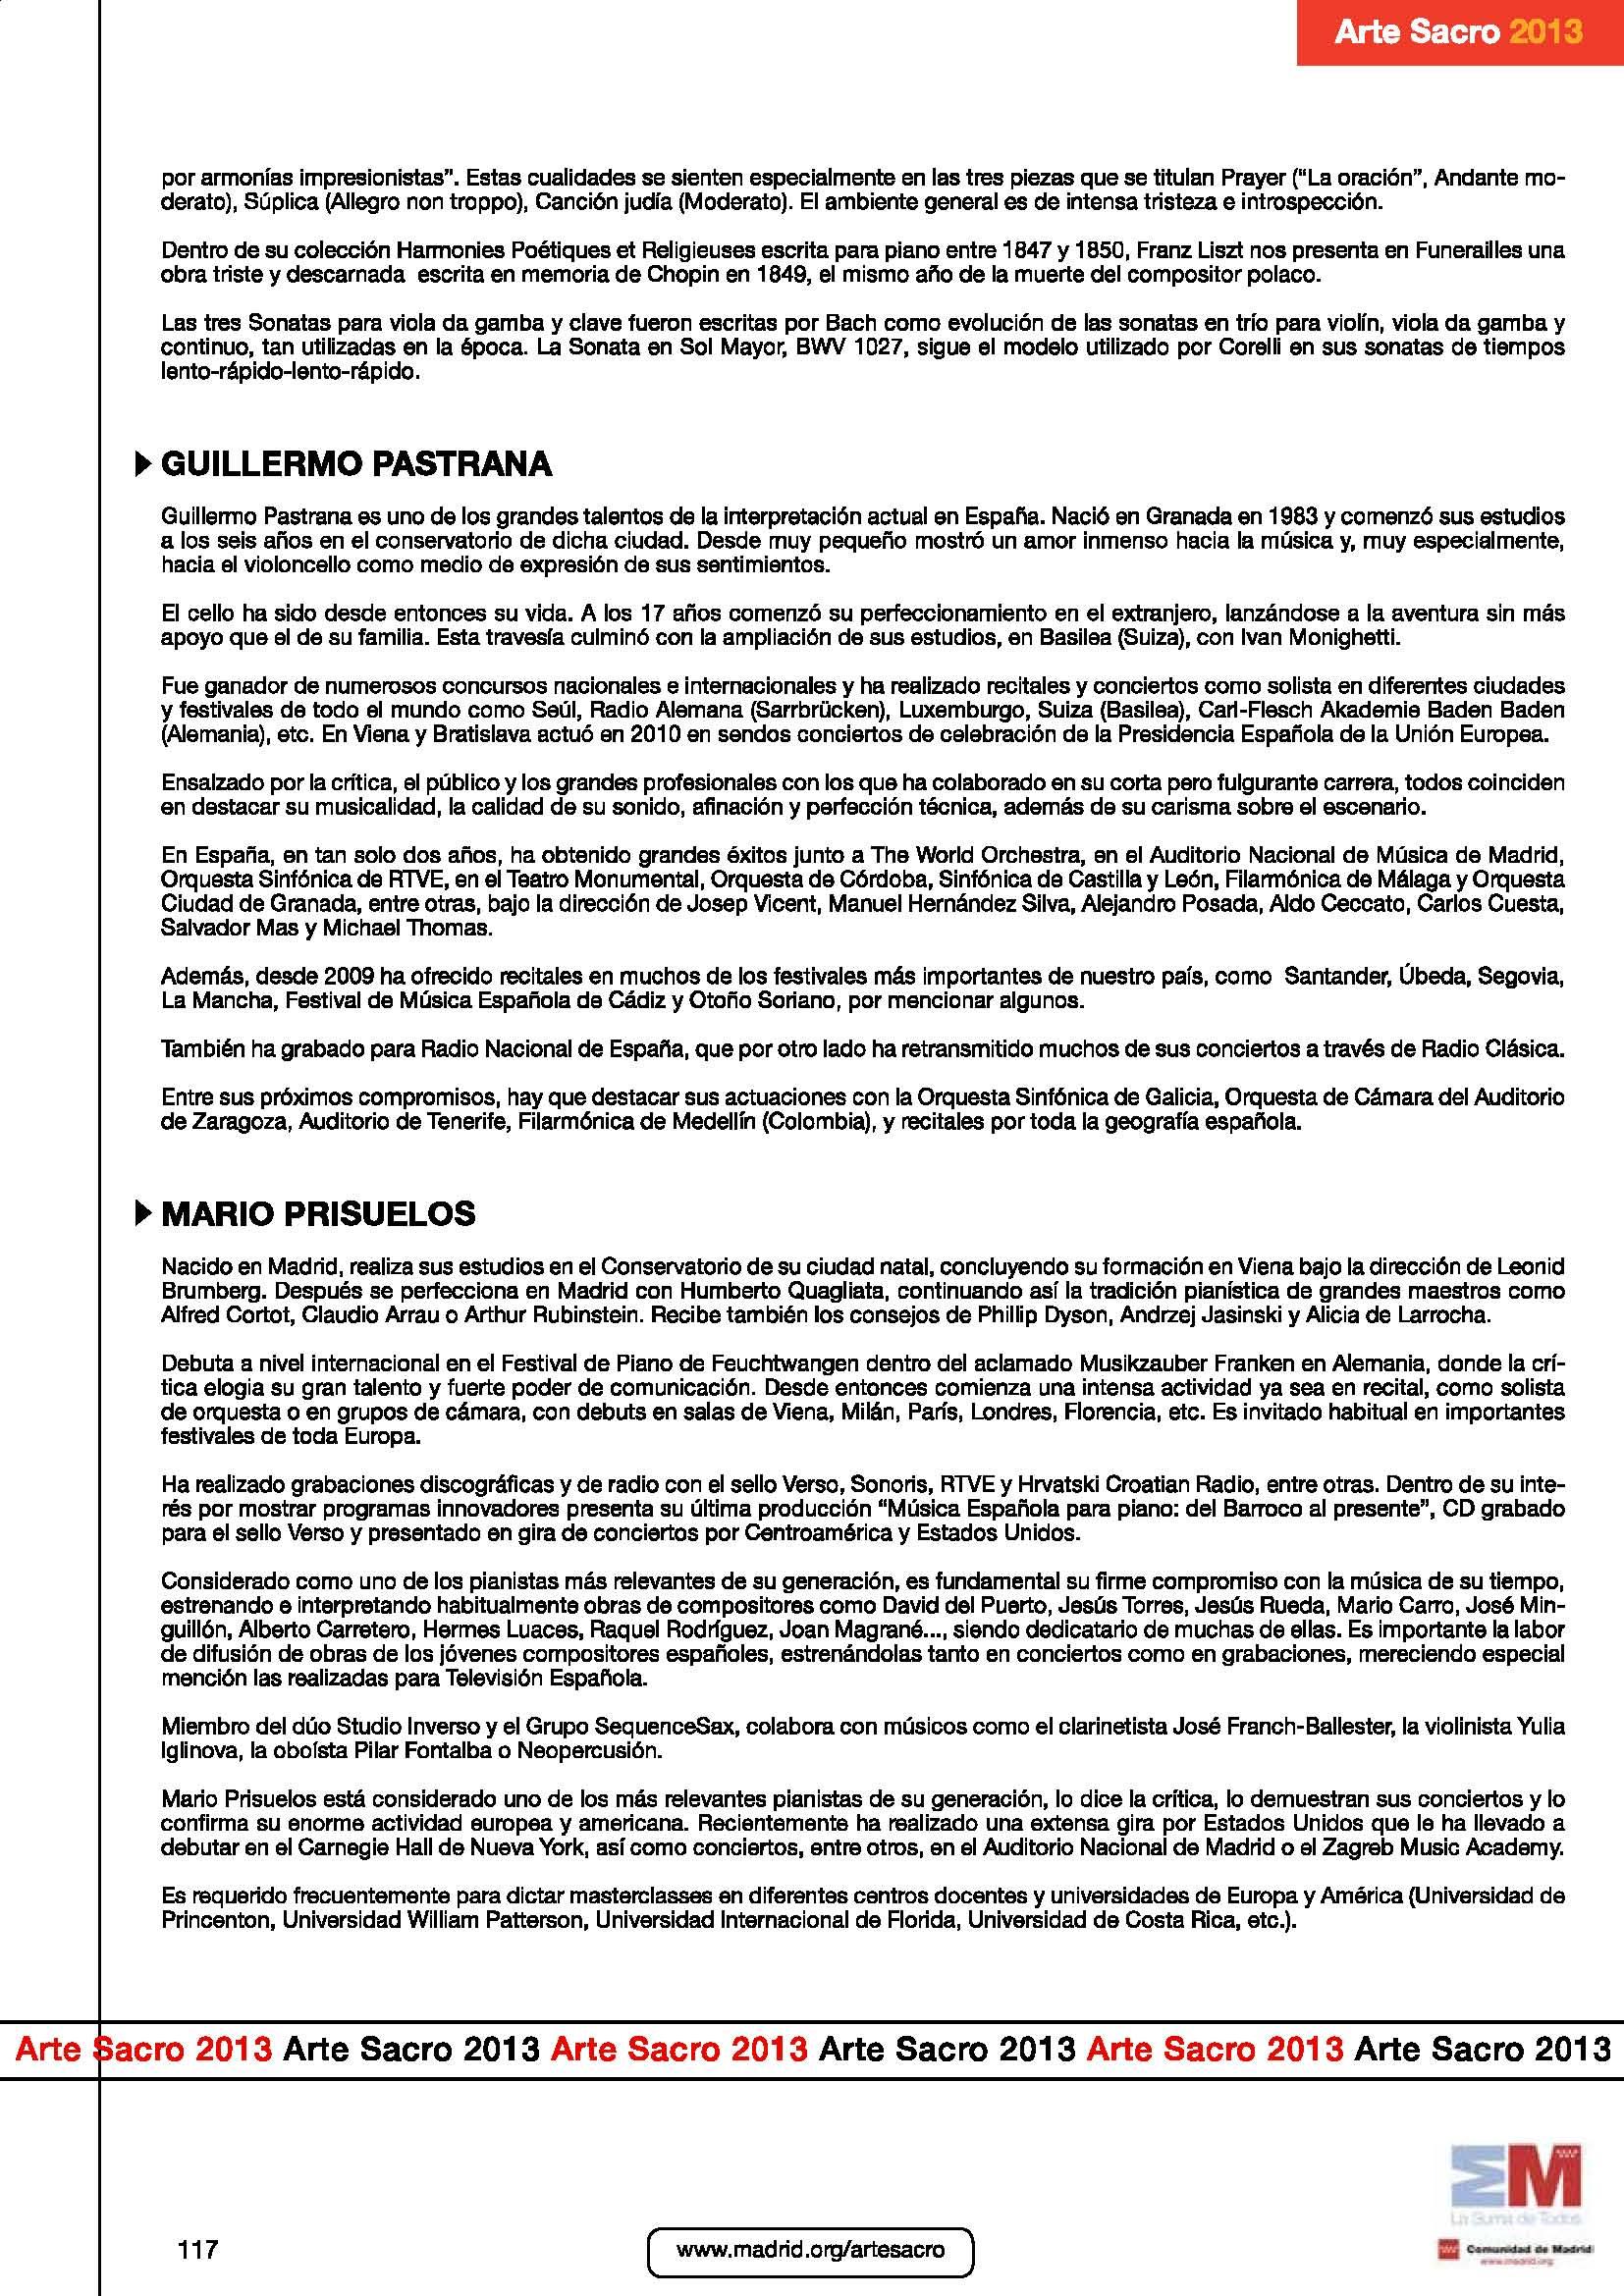 dossier_completo_Página_117